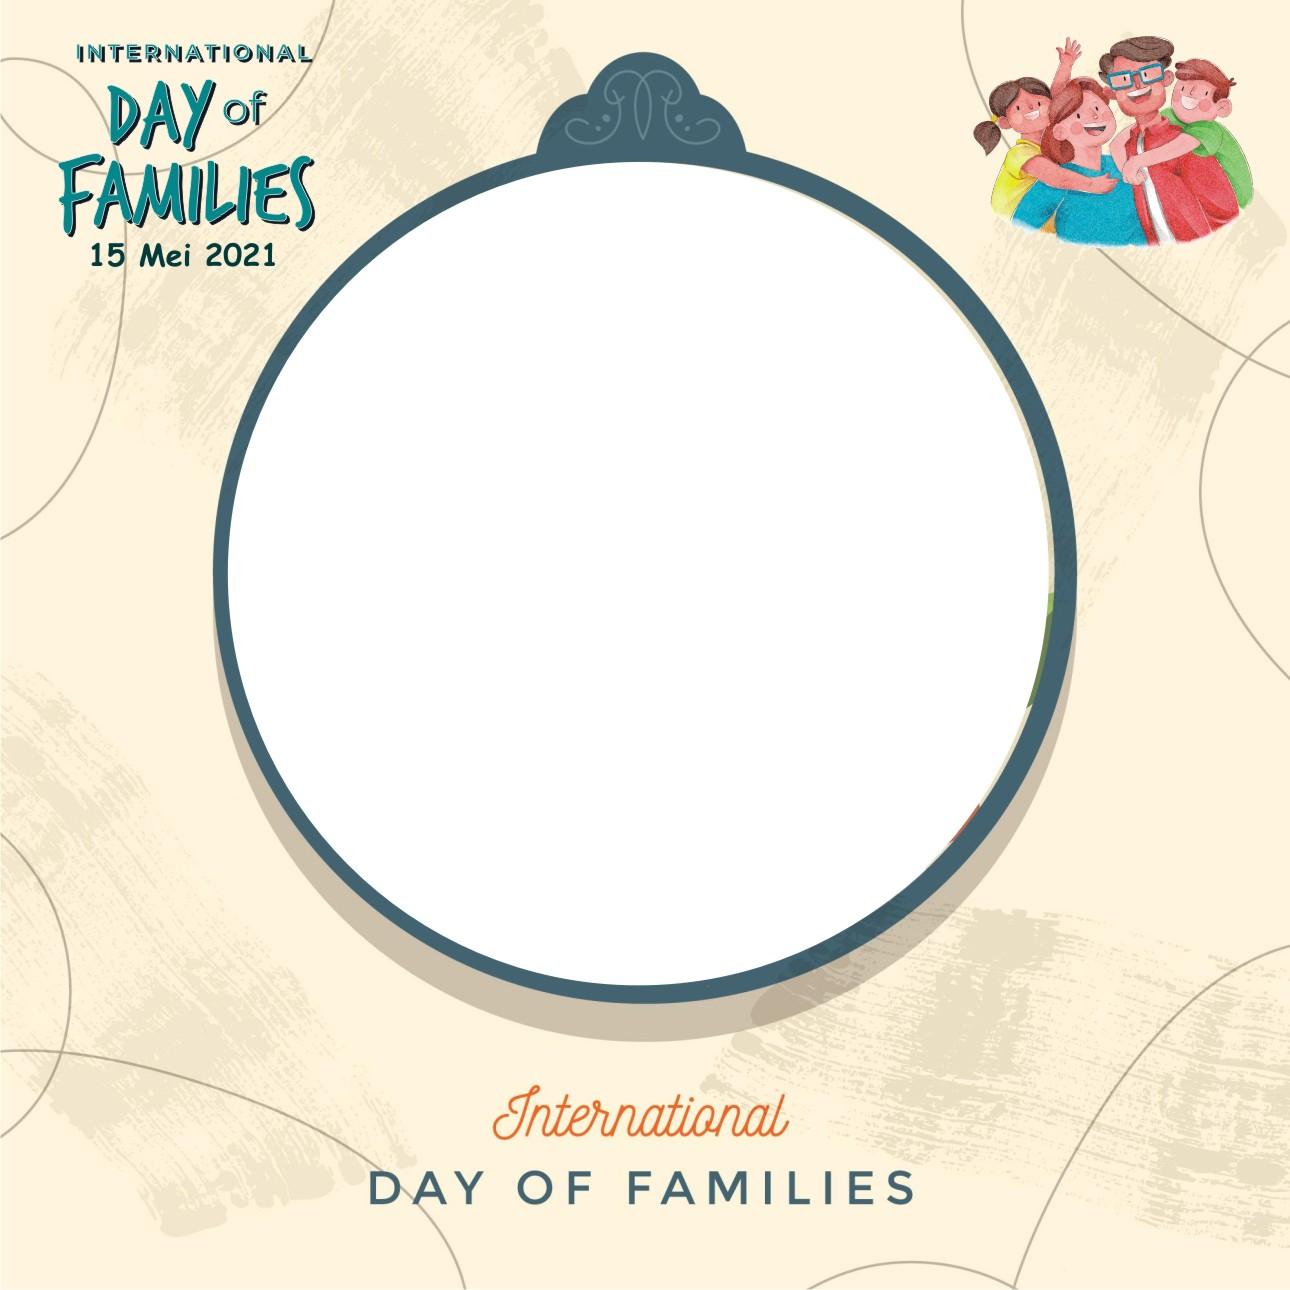 Twibbon hari keluarga internasional 2021